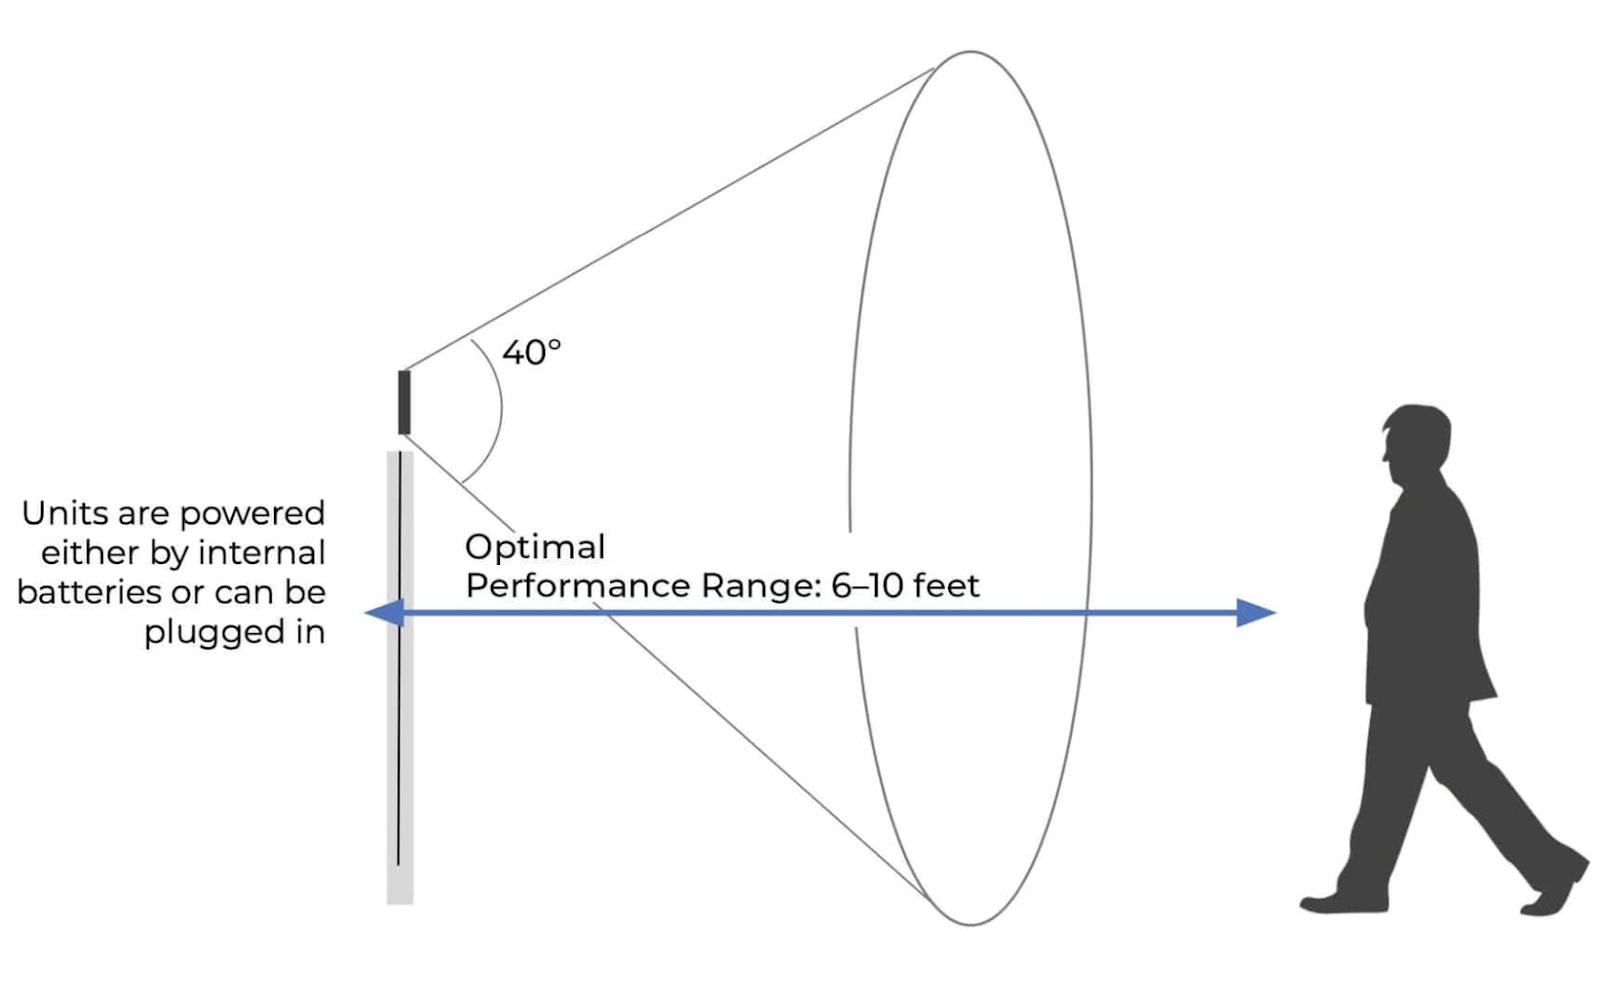 diagram for feevr scanner in use